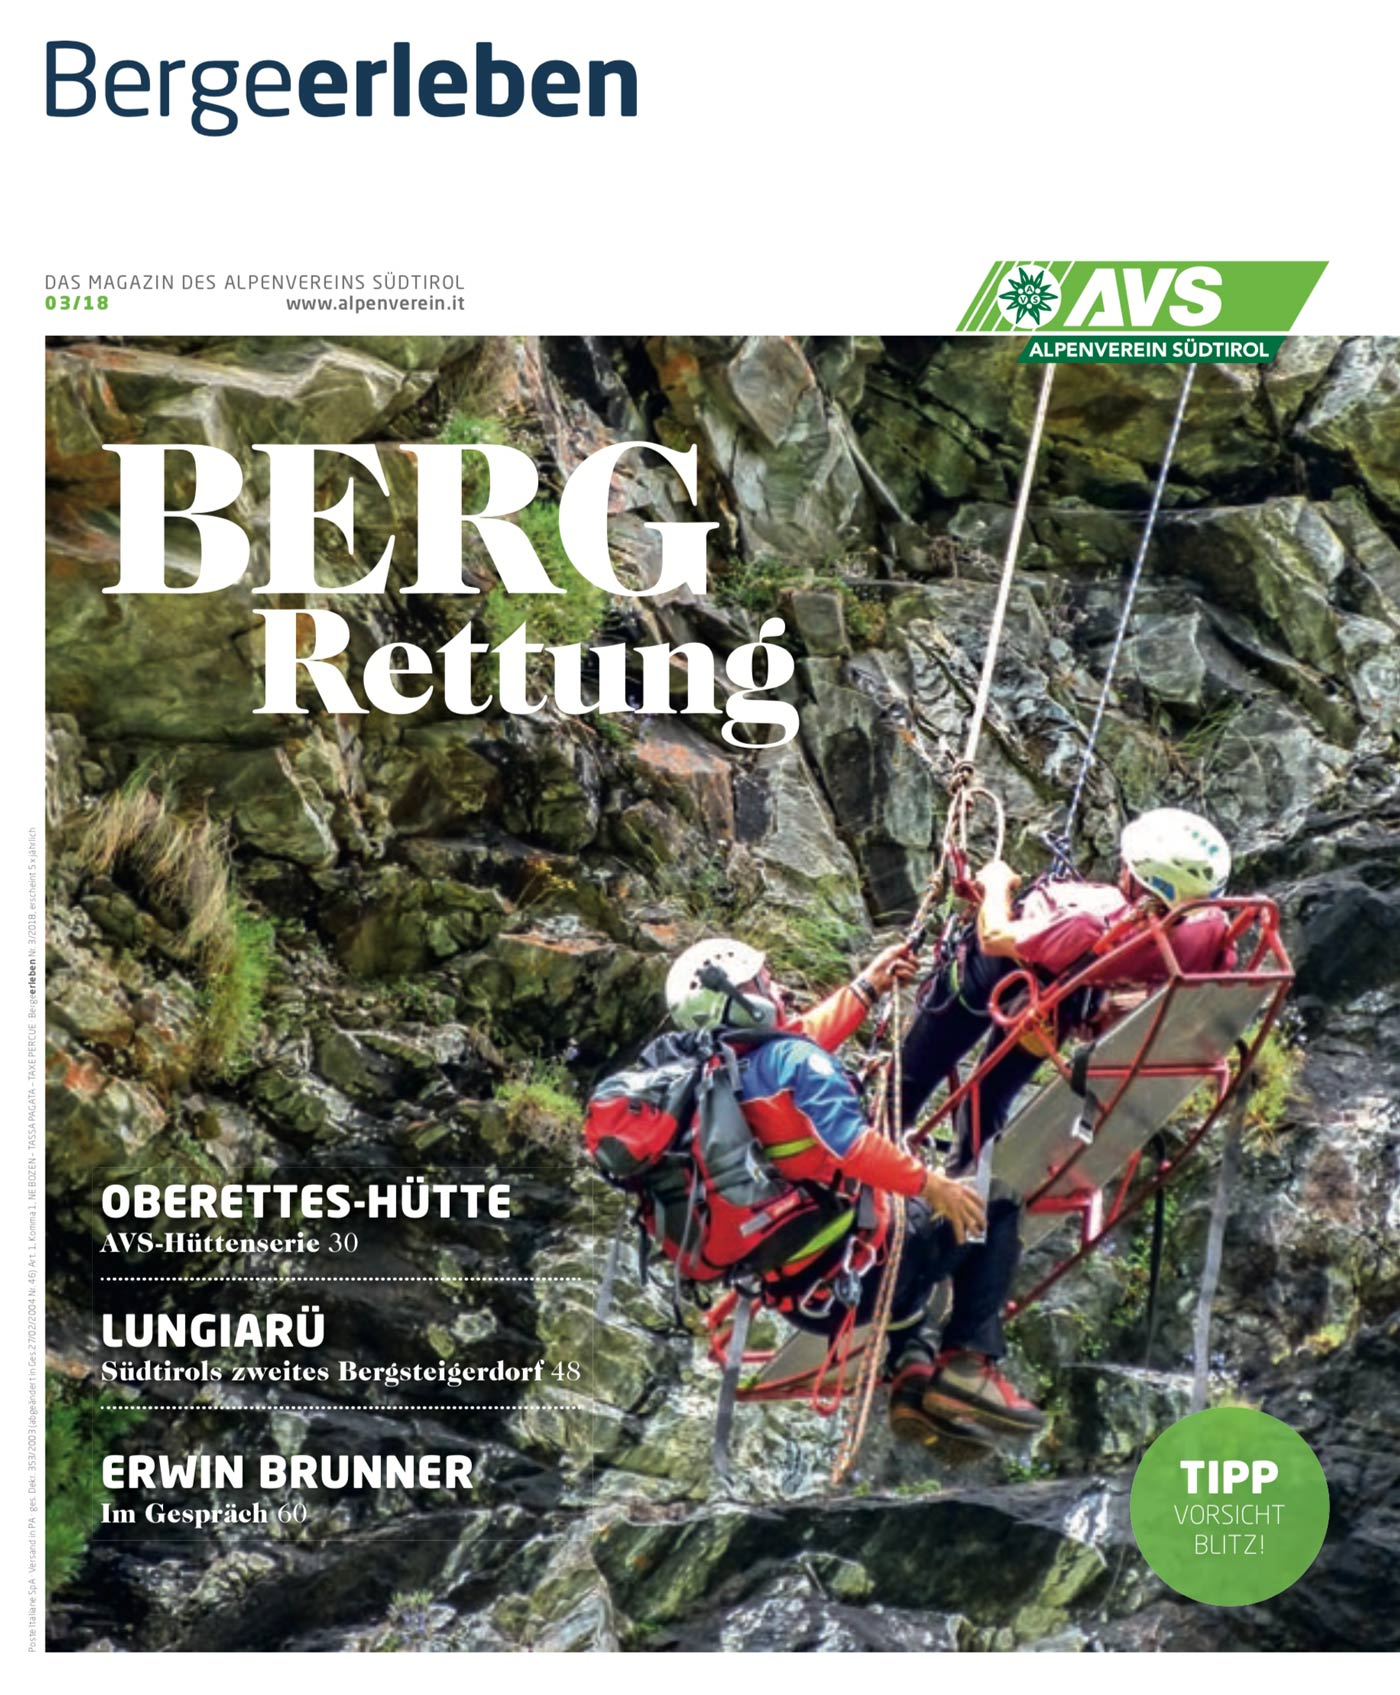 AVS Bergerlebnis I alpinonline